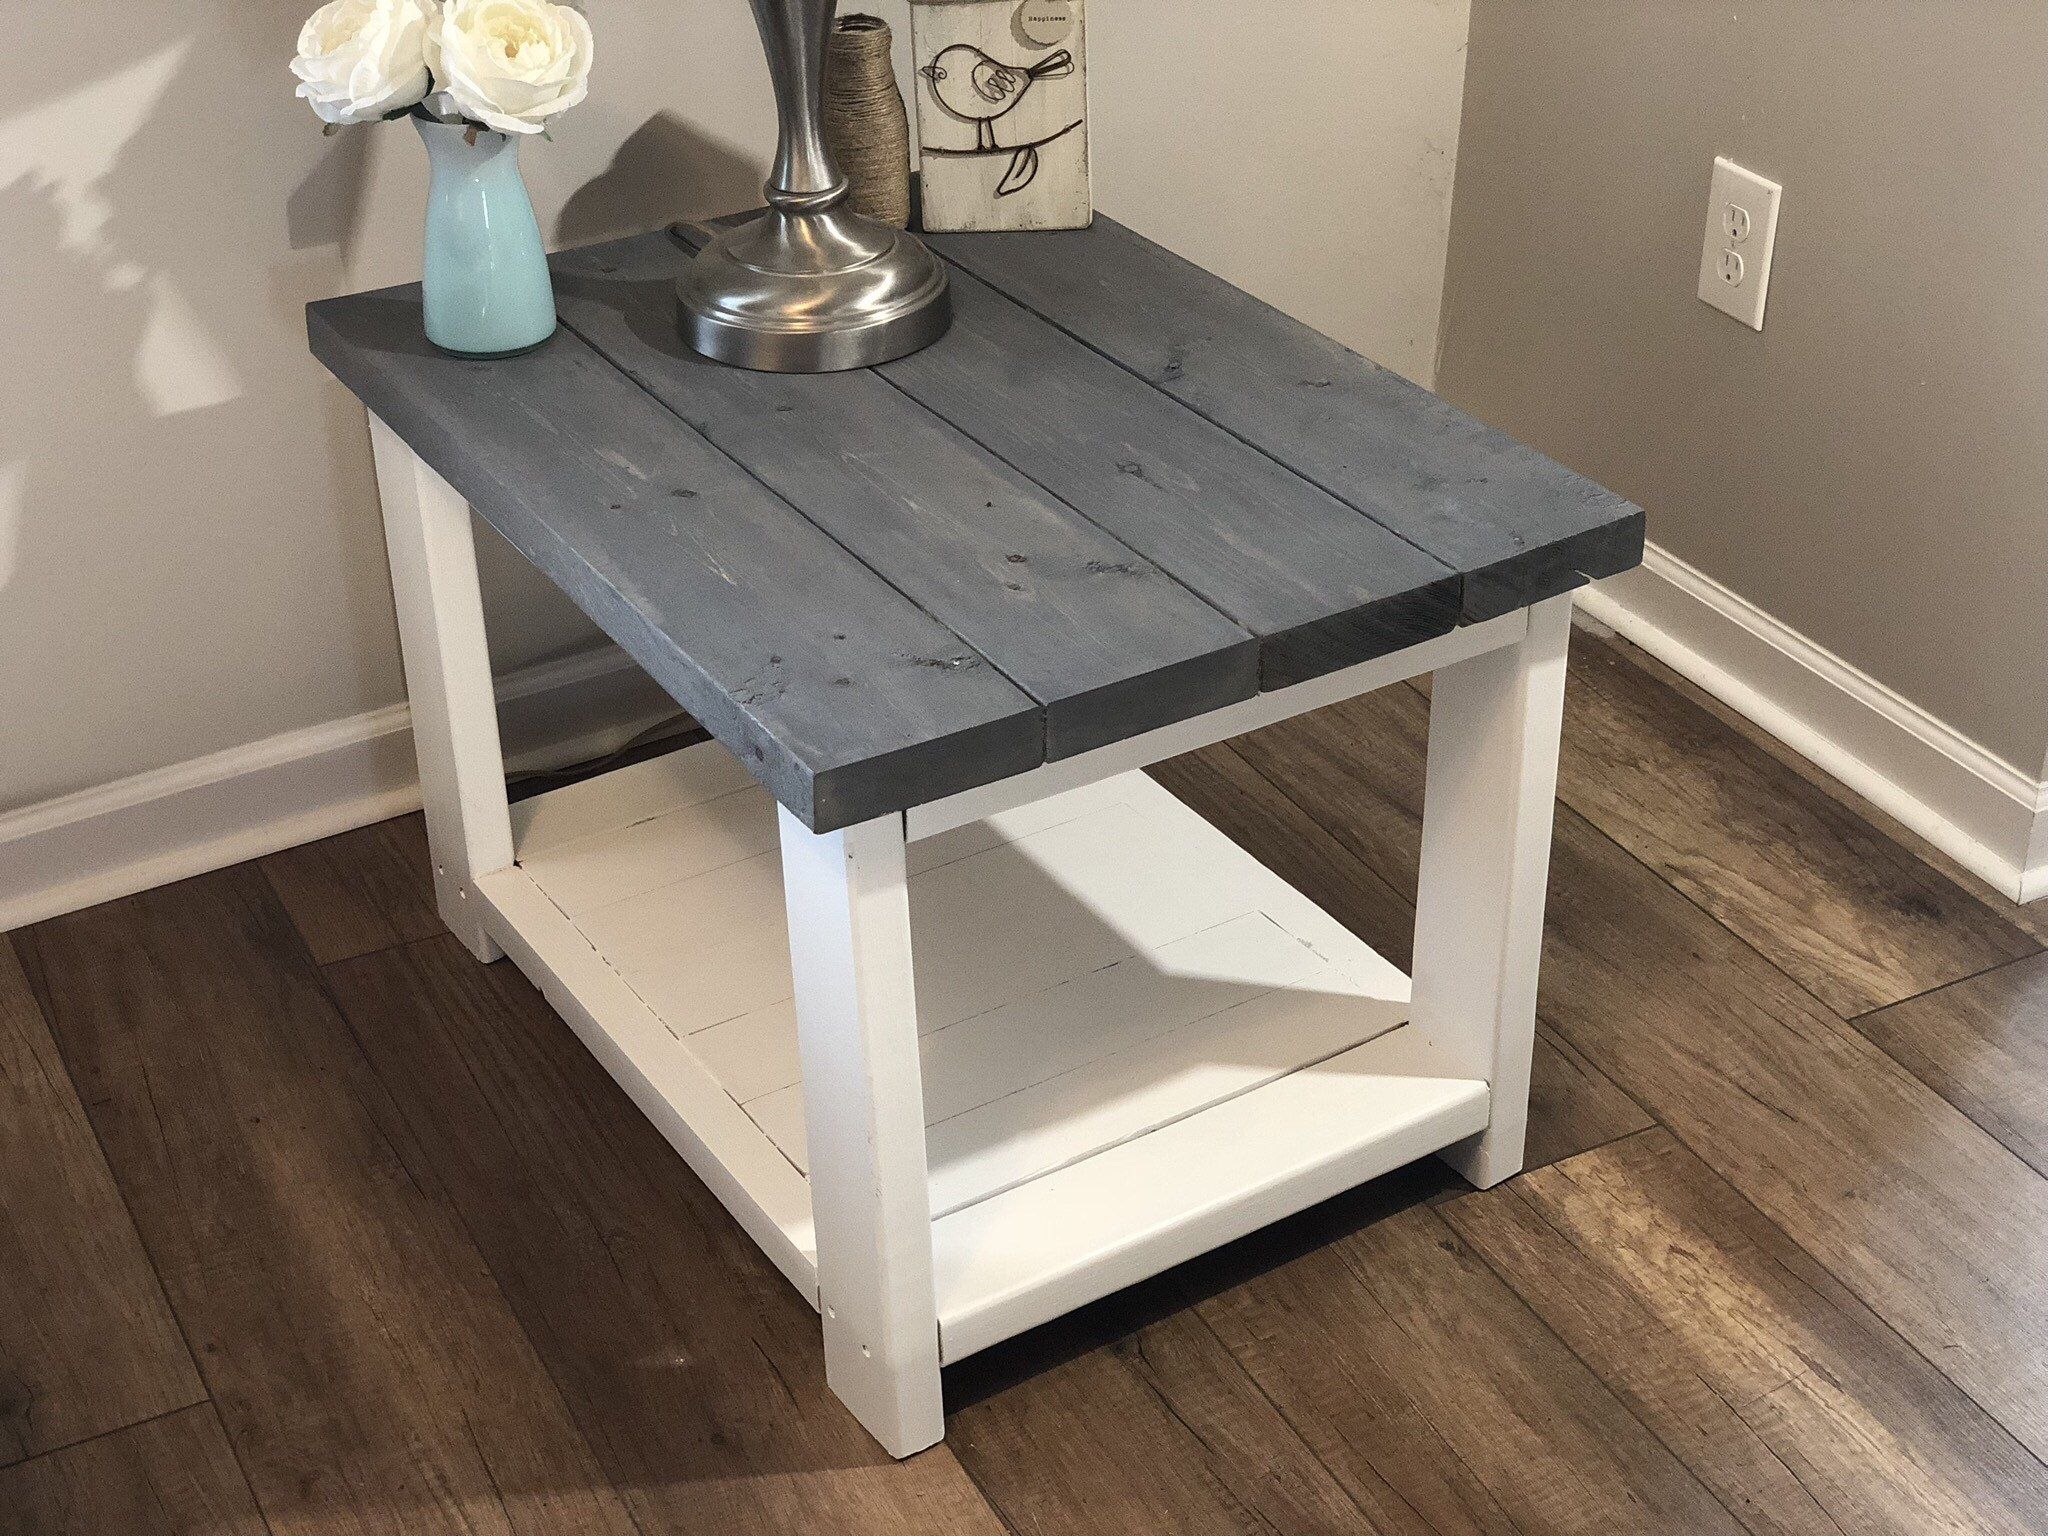 Farmhouse Coffee Table With Shelf Rustic Coffee Table Wood